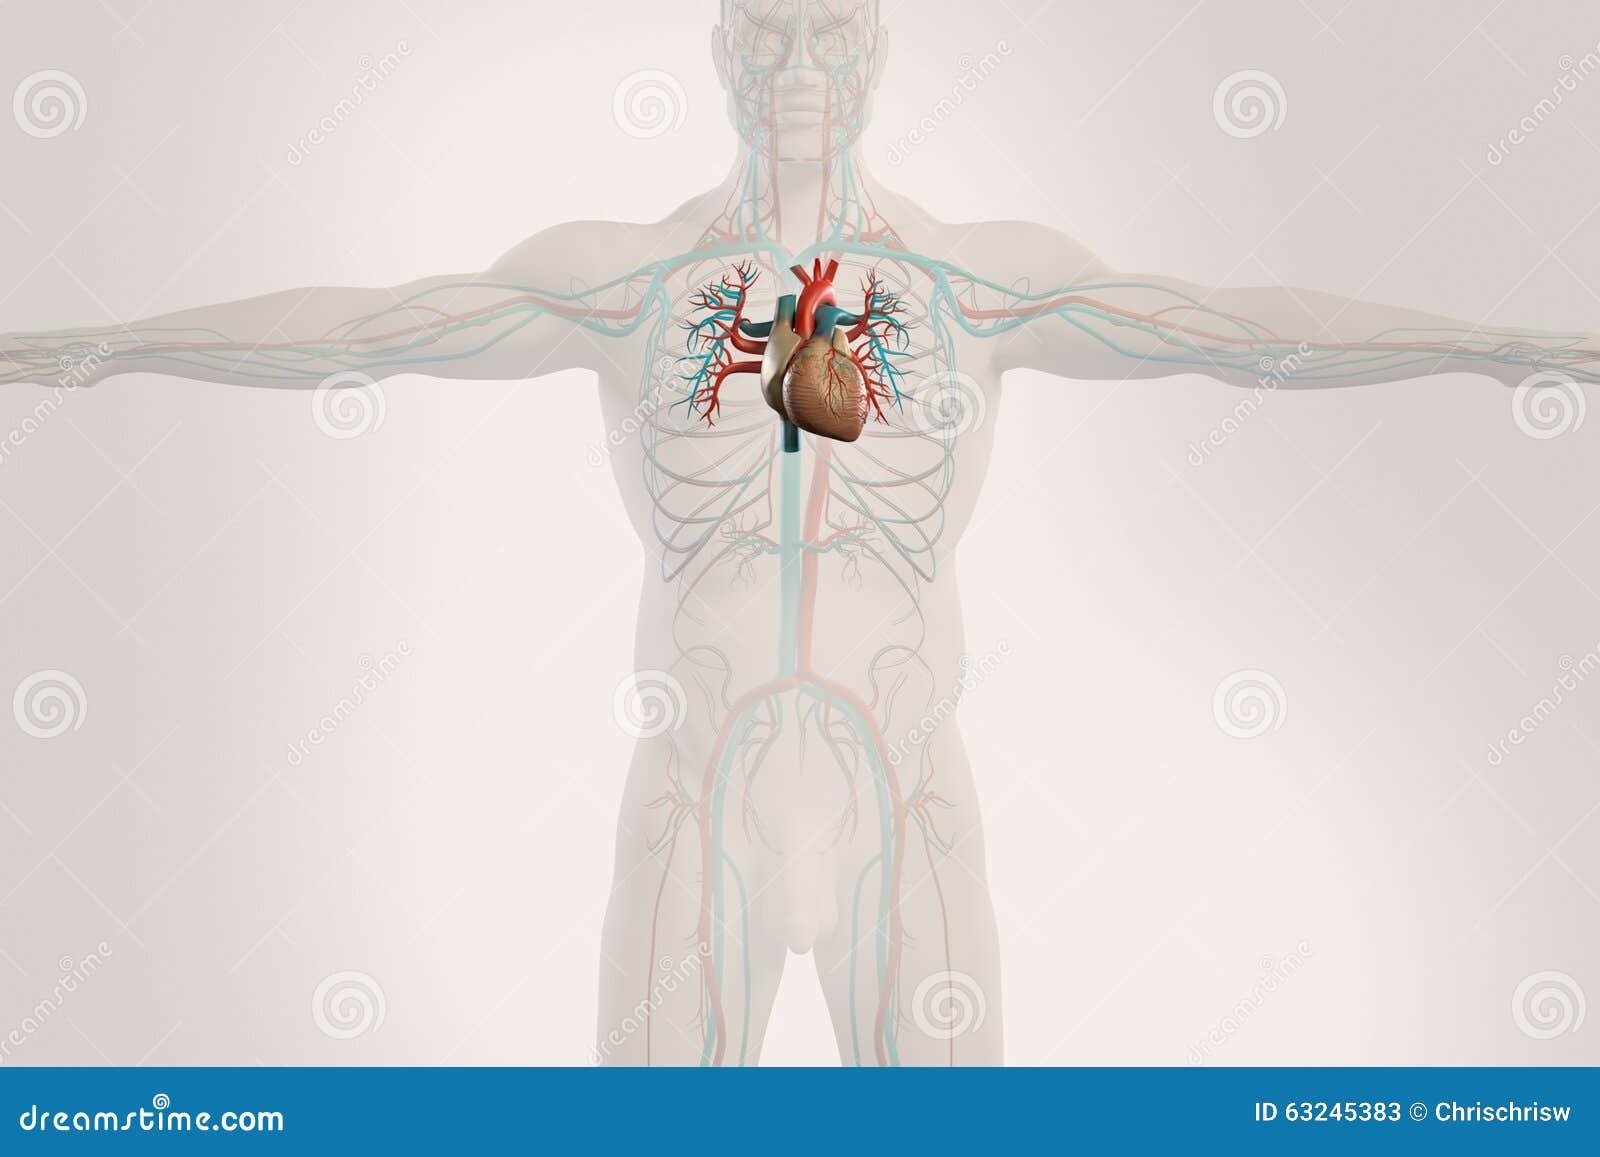 Human Anatomy Xray View Of Circulatory System On Light Background